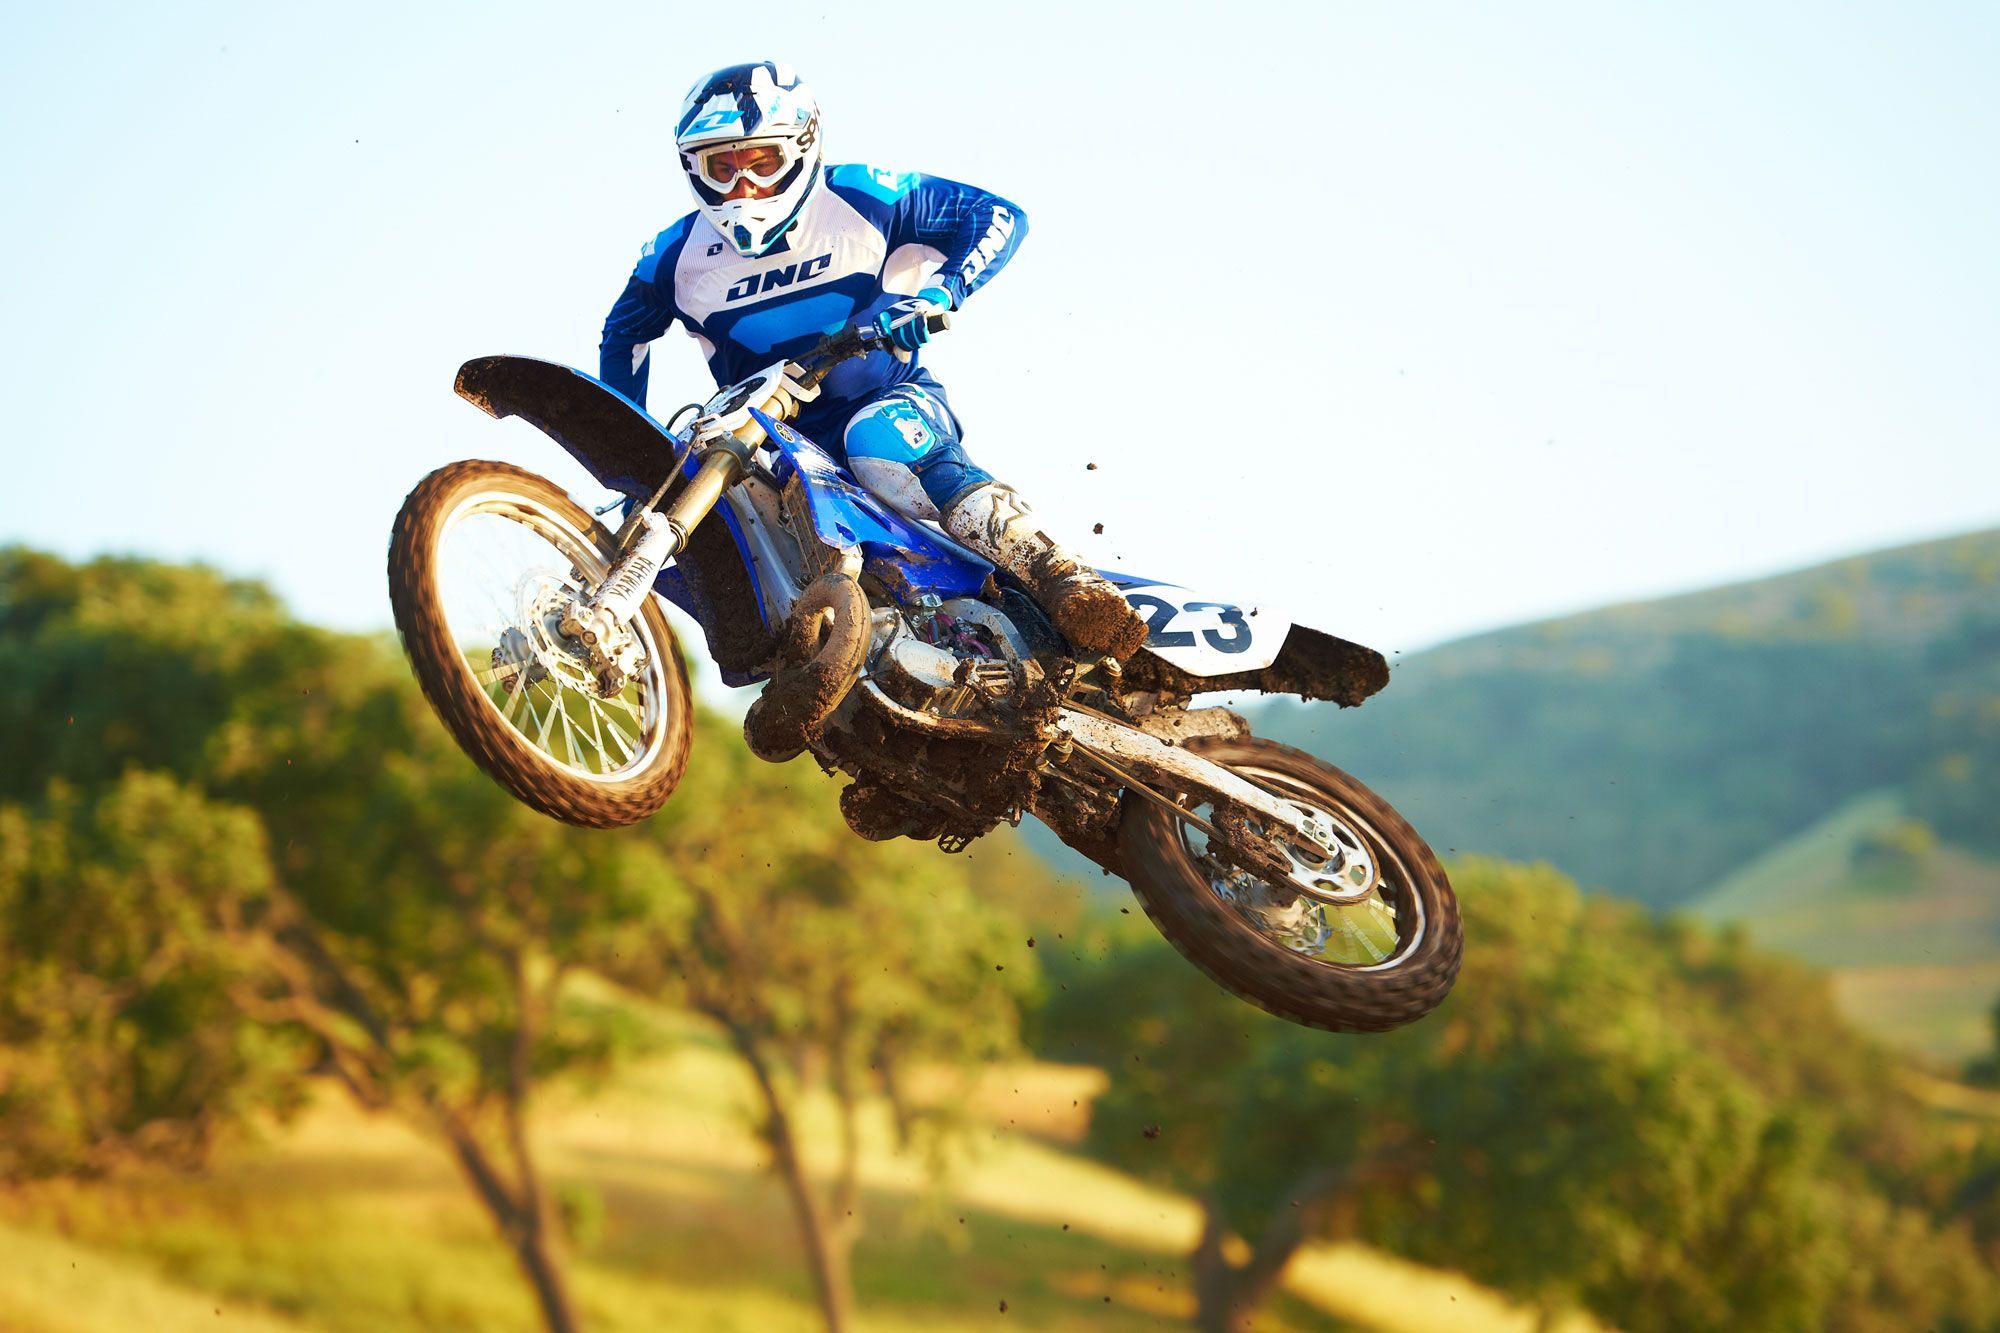 Click on image to download 1991 YAMAHA YZ250 2-STROKE MOTORCYCLE REPAIR  MANUAL